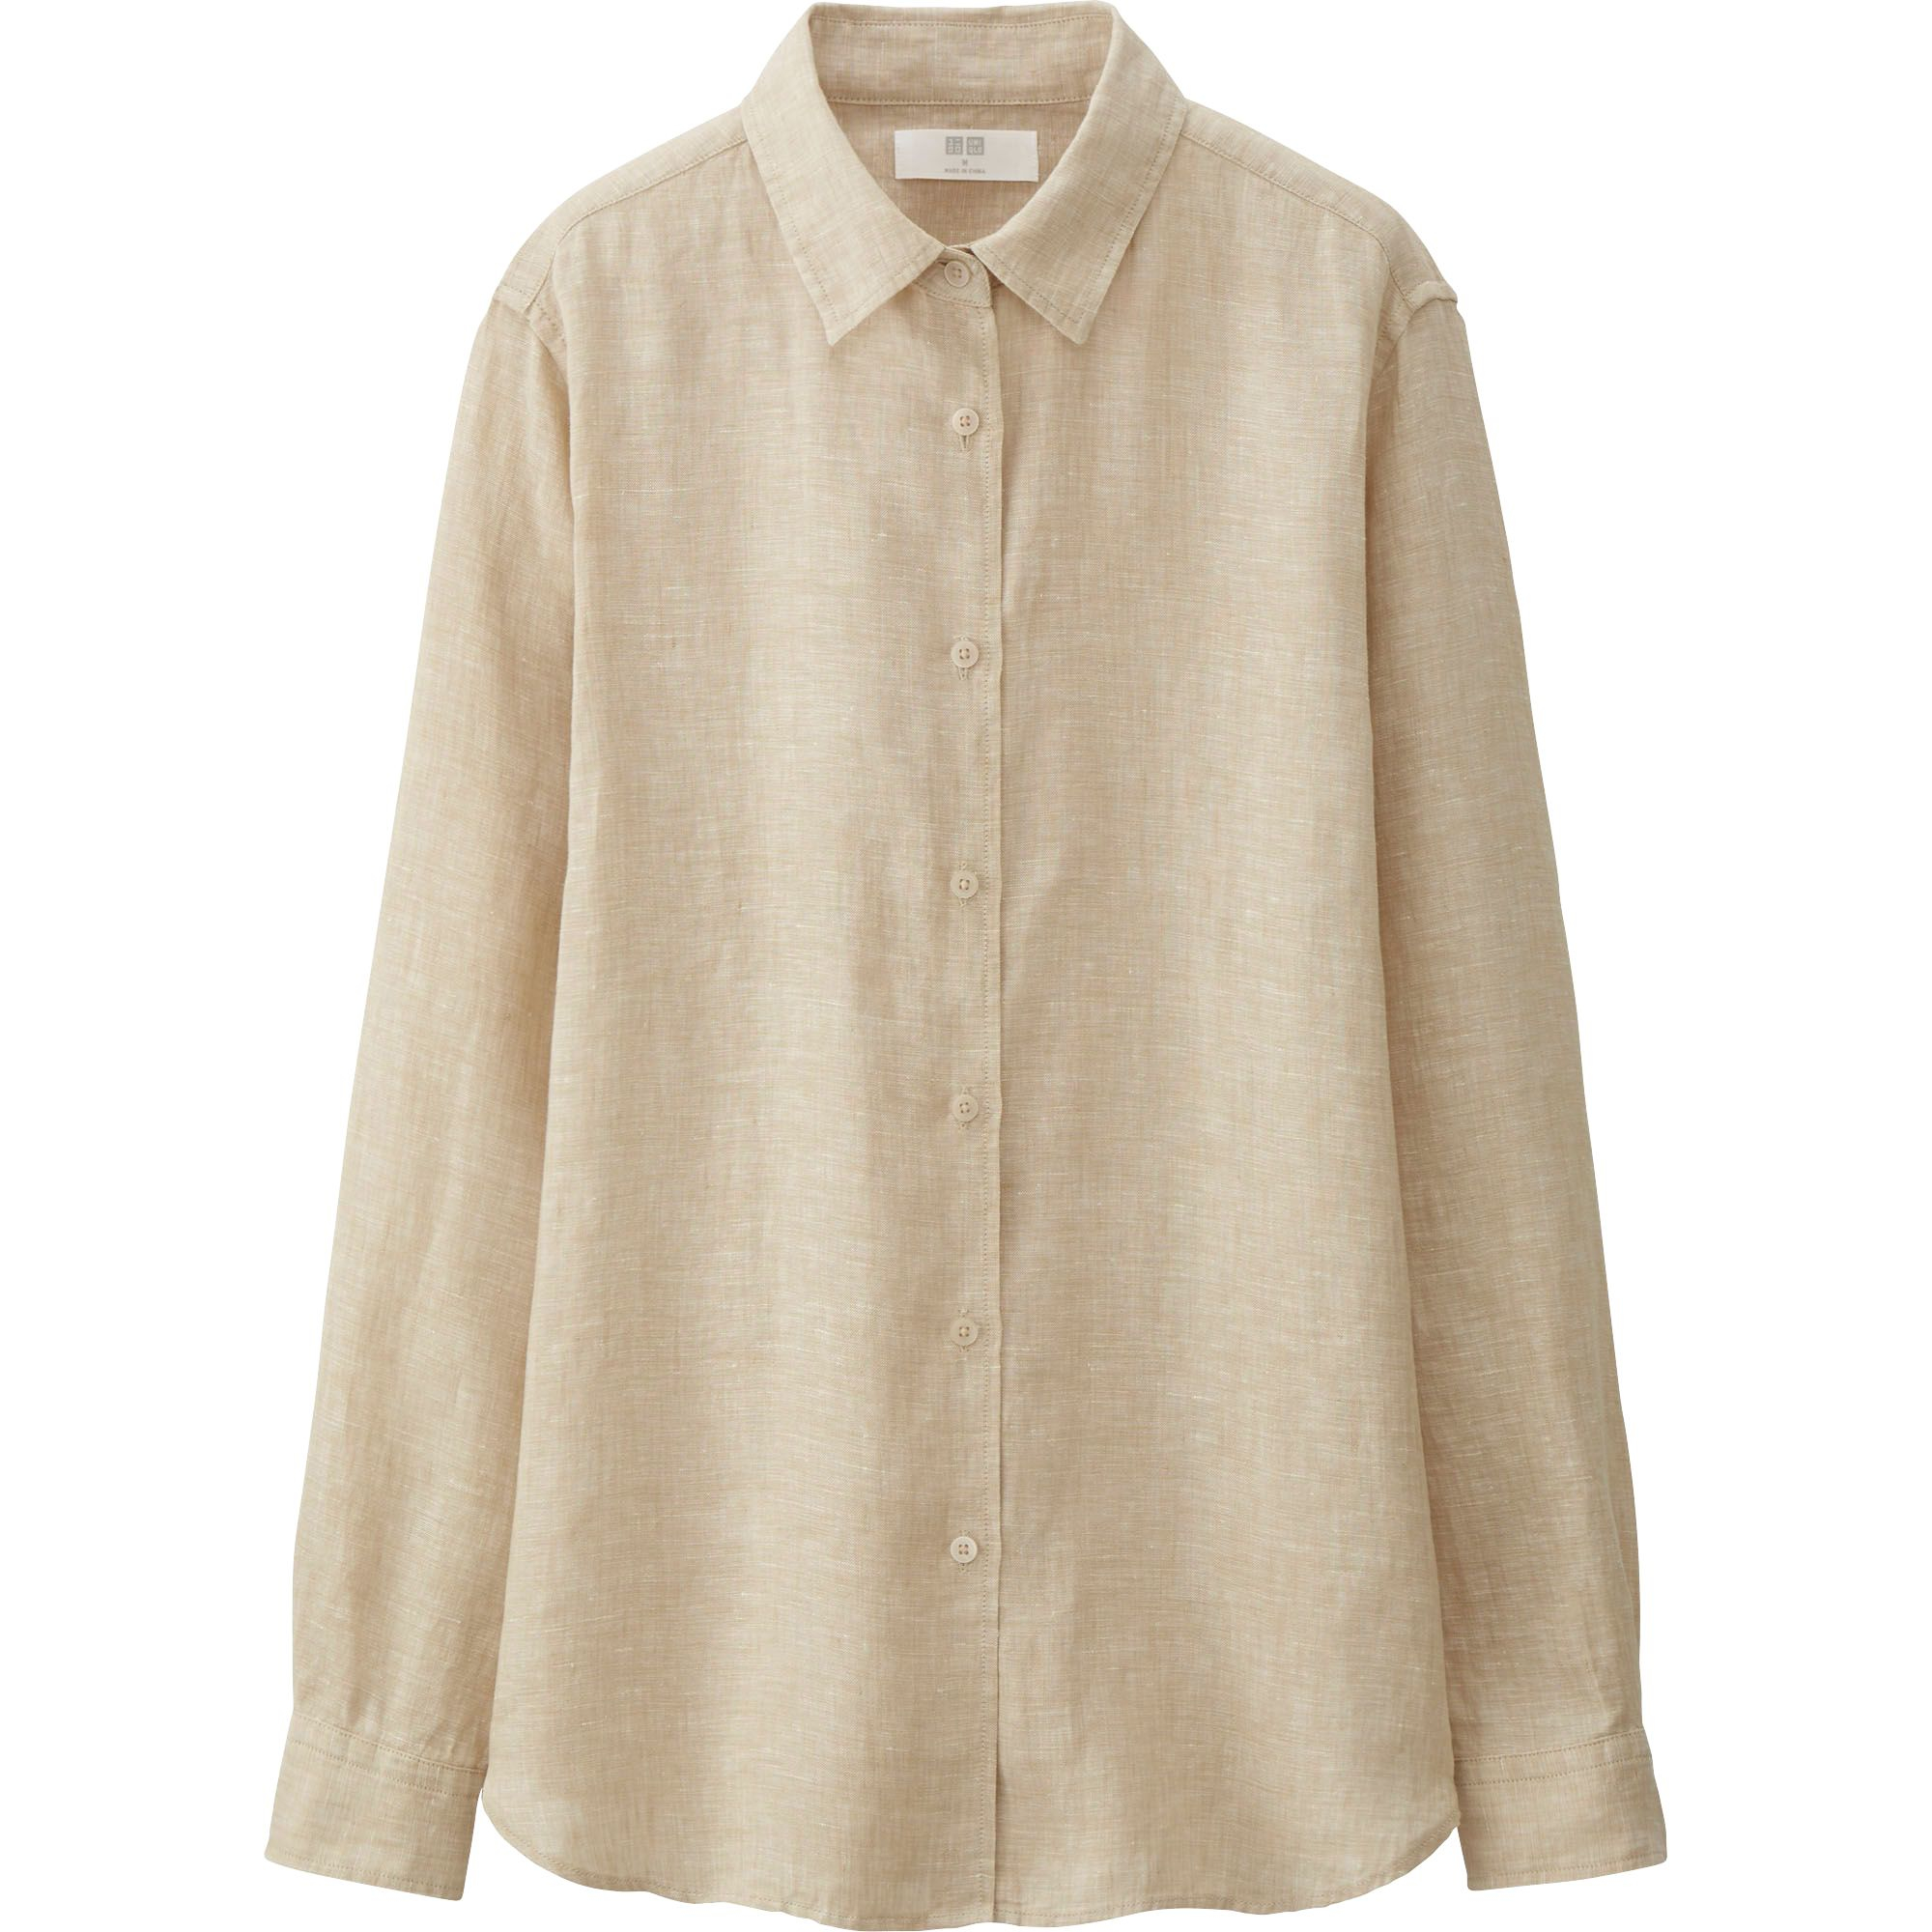 Uniqlo women 39 s premium linen long sleeve button front for Uniqlo premium t shirt